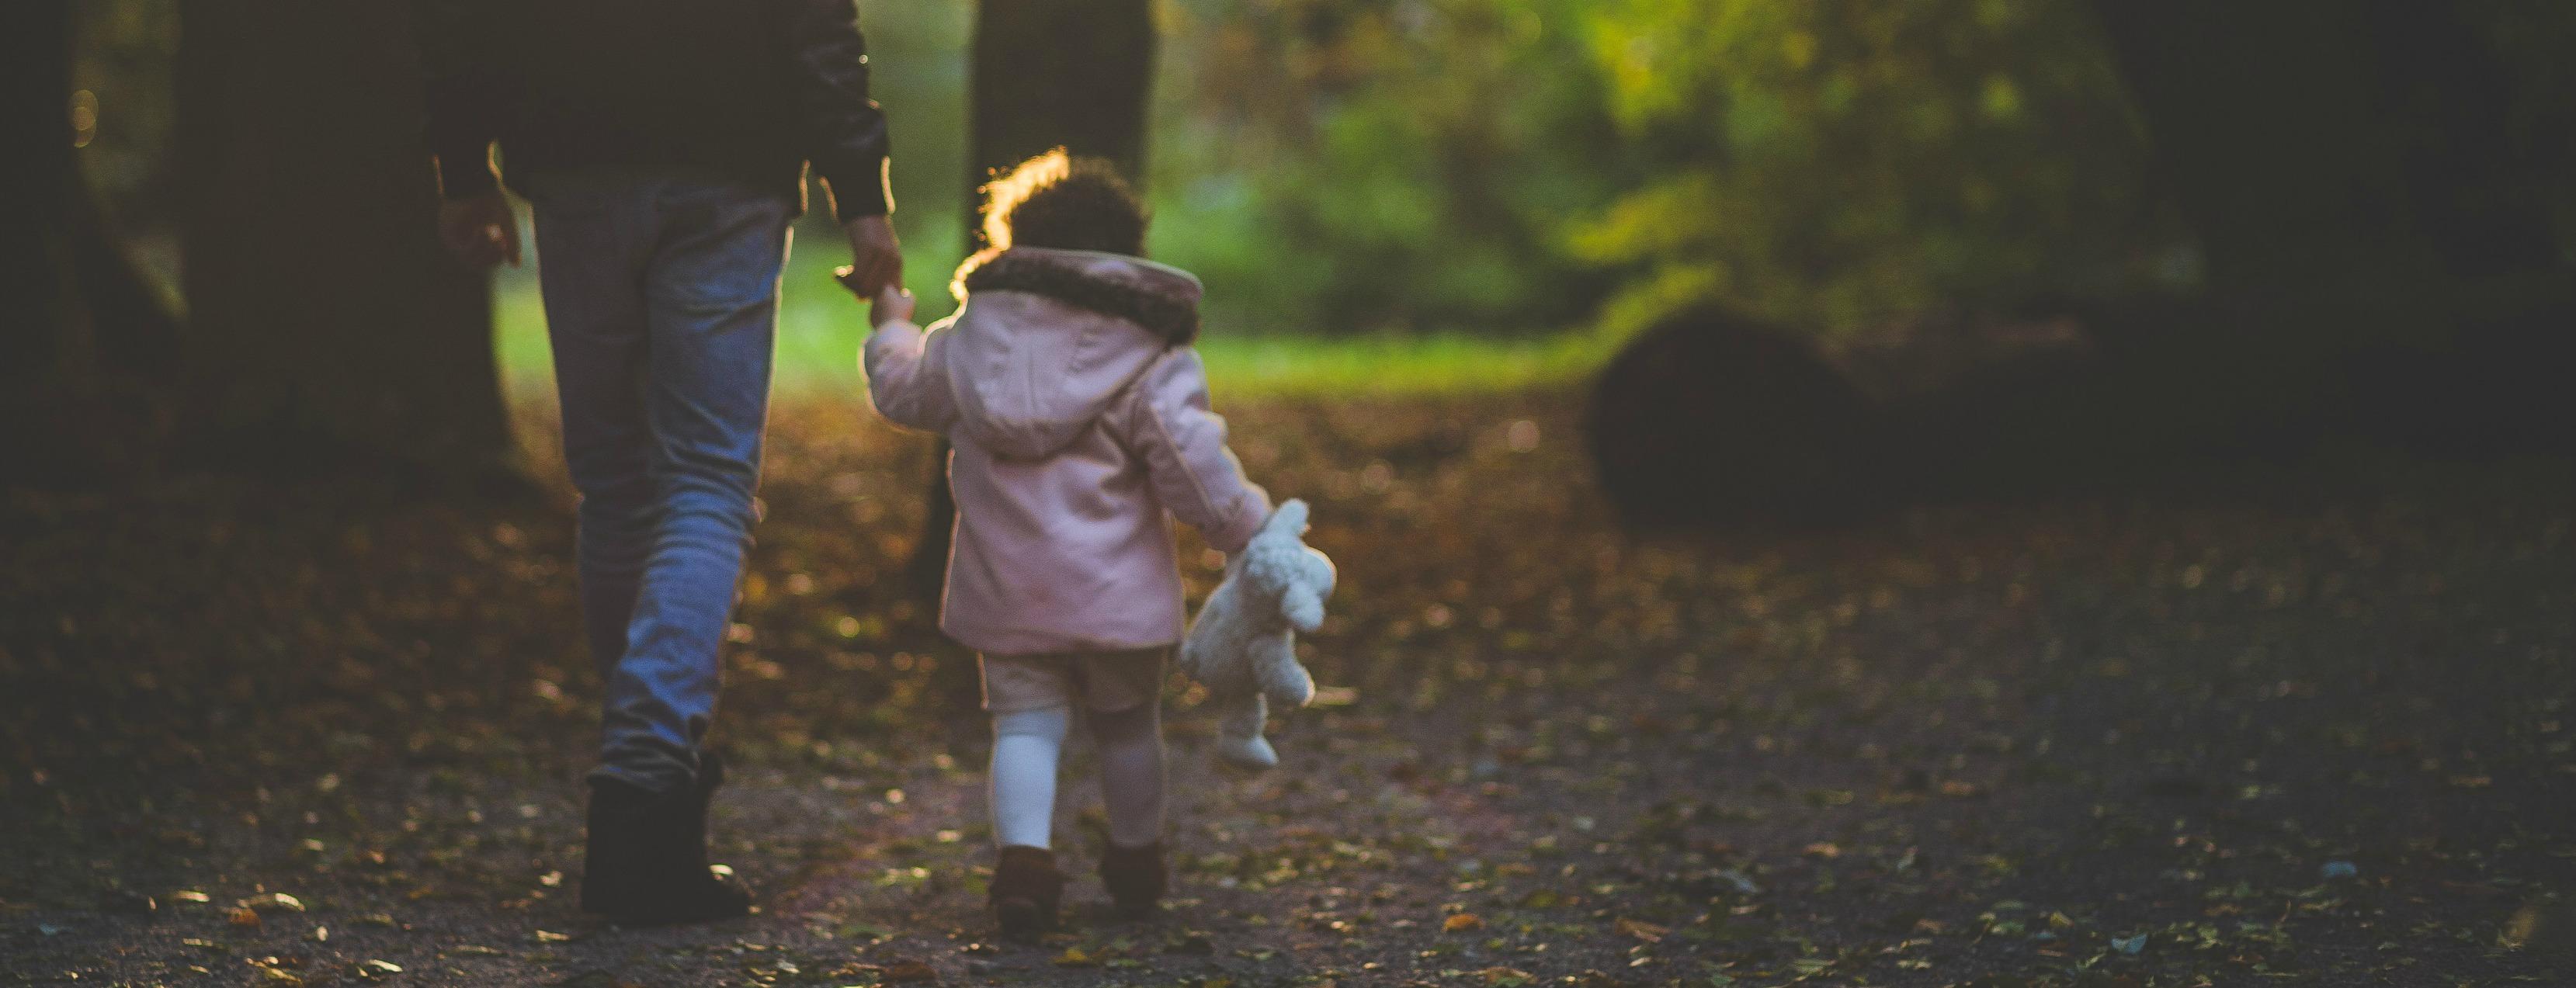 child-dad-daughter-139389